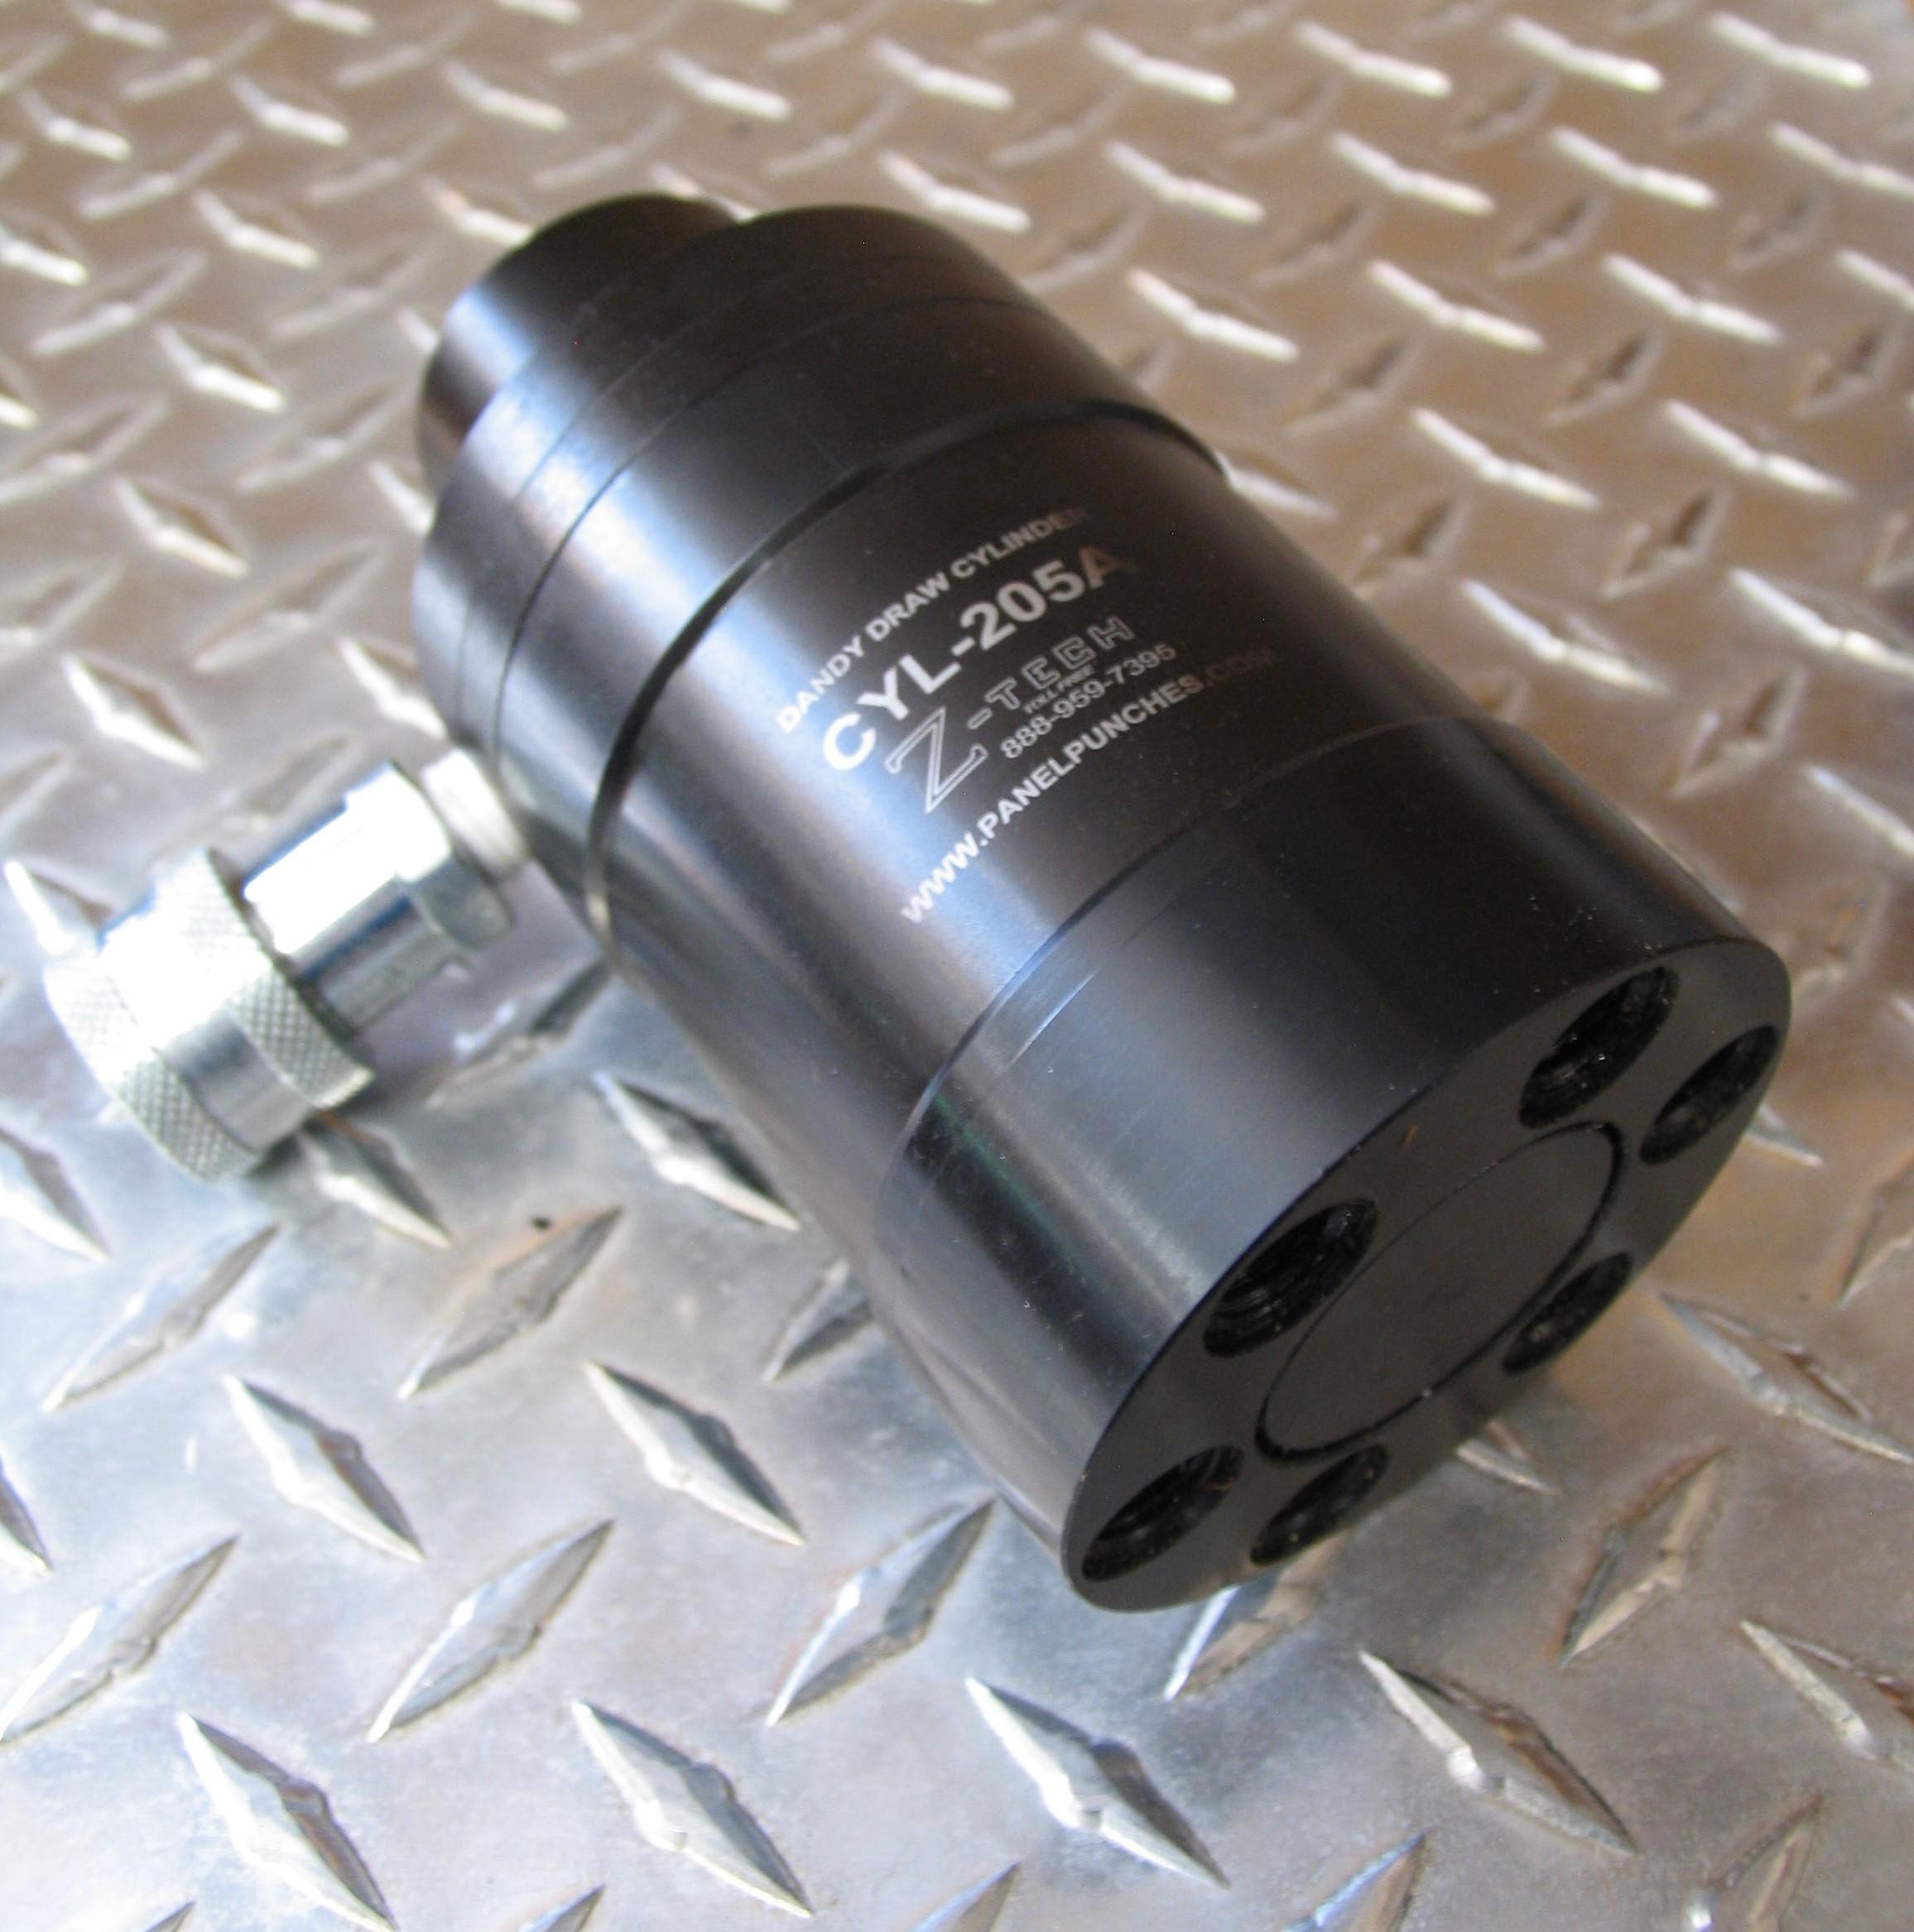 Universal Draw Cylinder -  Pulls all models of Dandy die as well as any standard Greenlee die set.